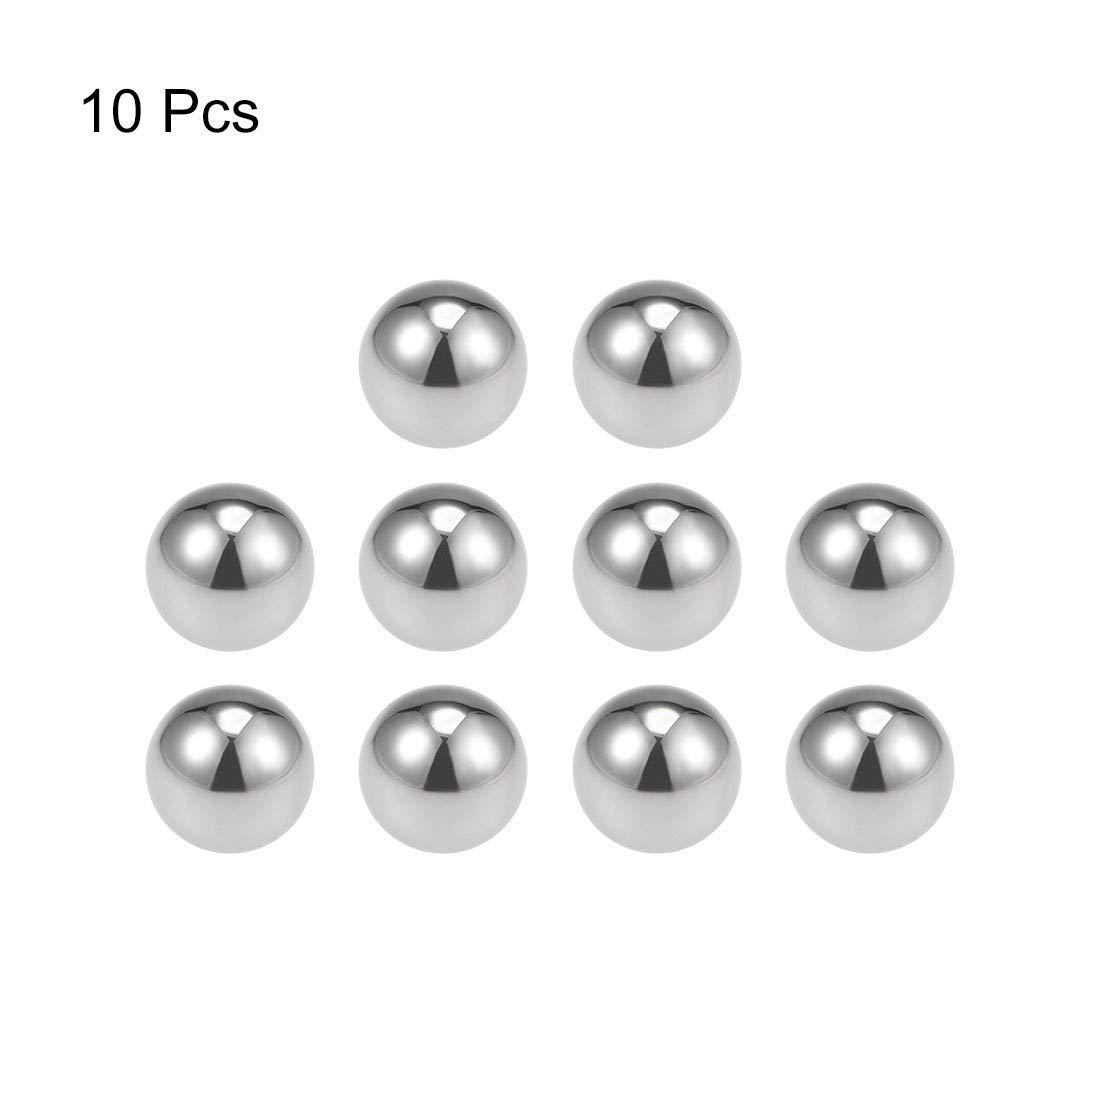 uxcell 1//4-inch Bearing Balls Tungsten Carbide G25 Precision Balls 10pcs